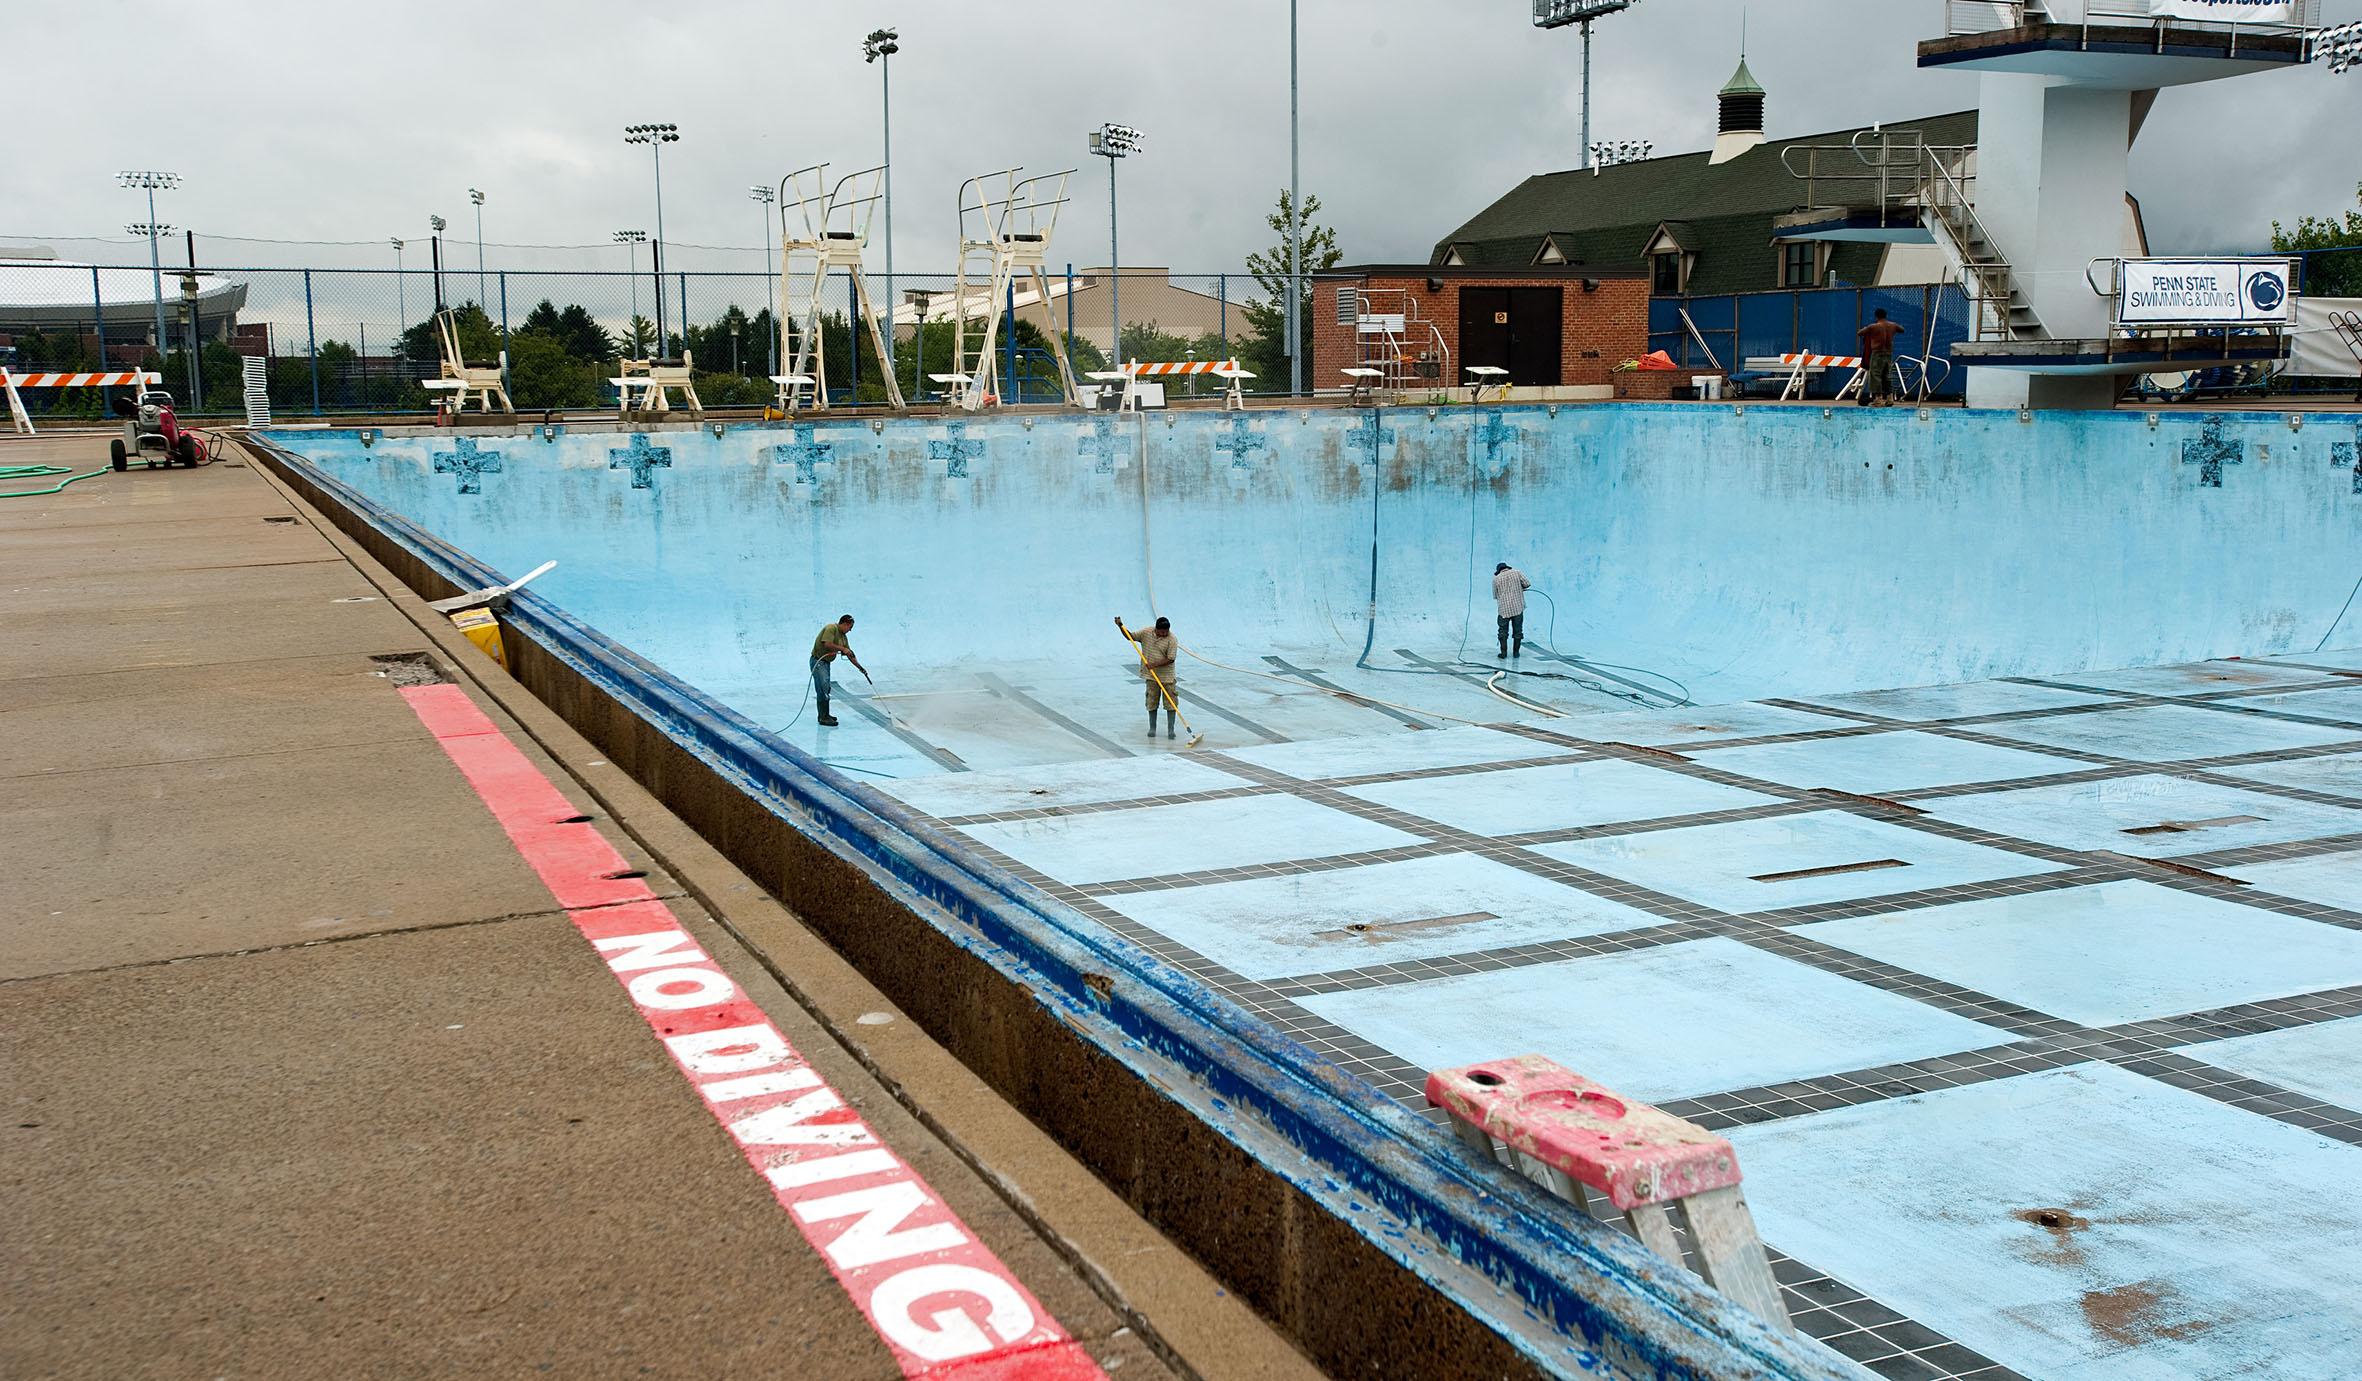 Valvula selectora piscina pierde agua with valvula for Piscina que pierde agua